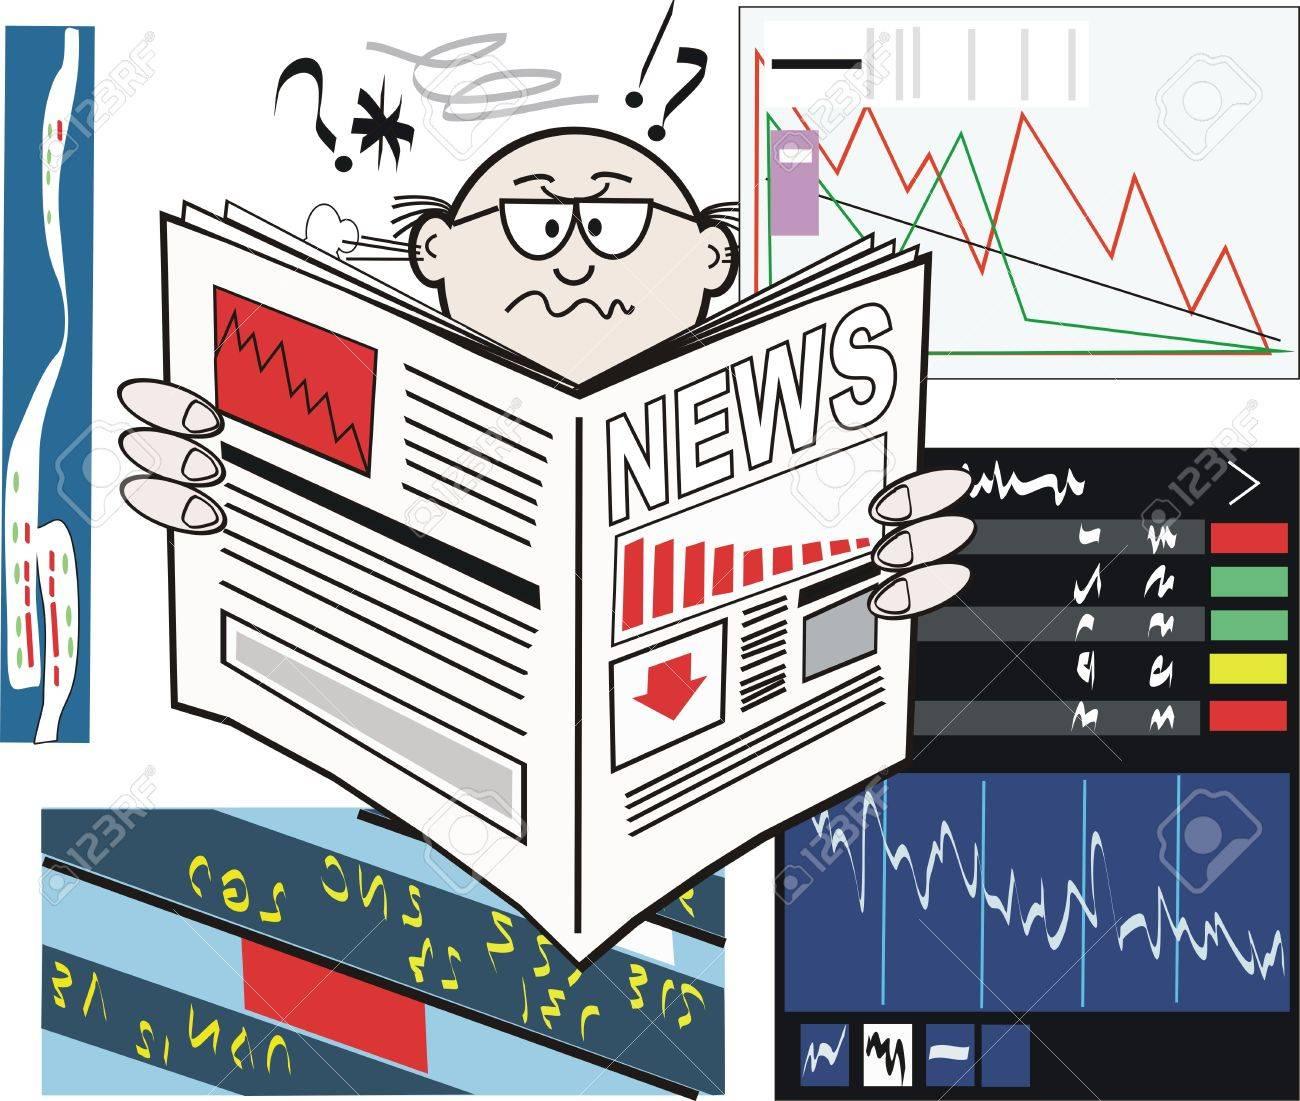 Share market newspaper cartoon Stock Vector - 7646263